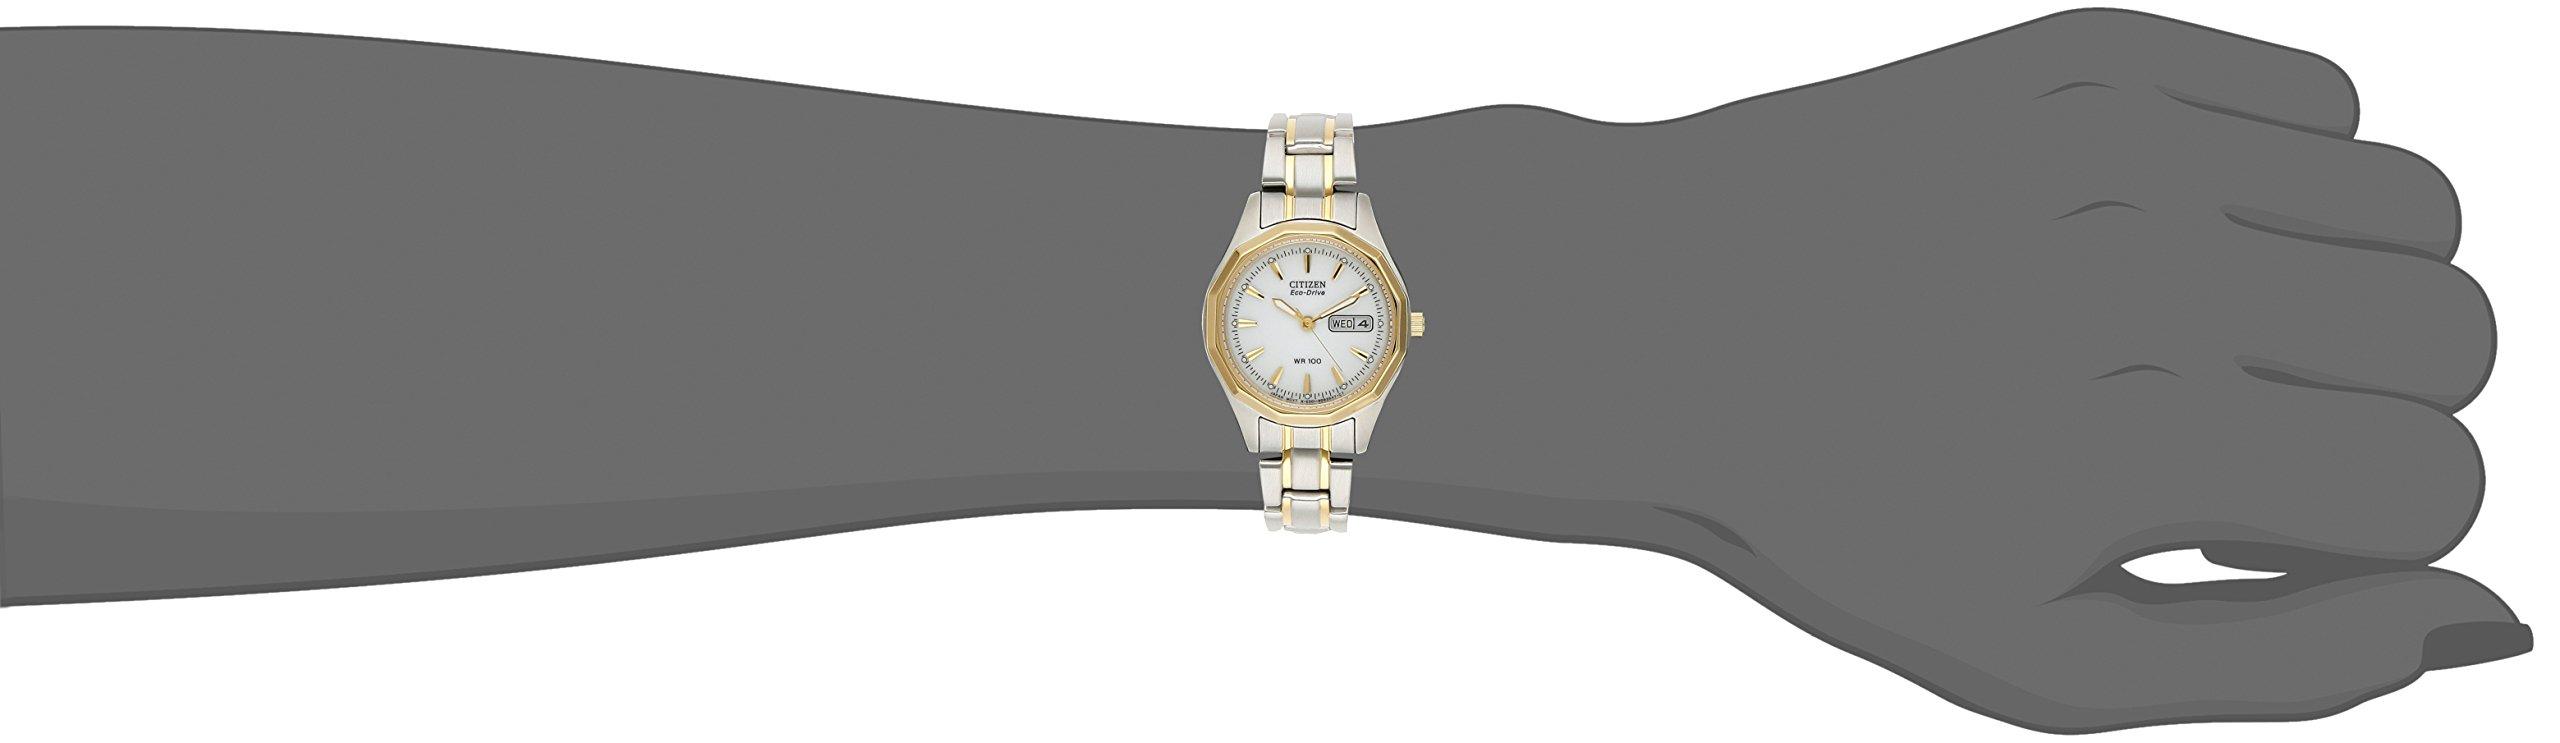 Citizen Women's EW3144-51A Eco-Drive Sport Two-Tone Watch by Citizen (Image #3)